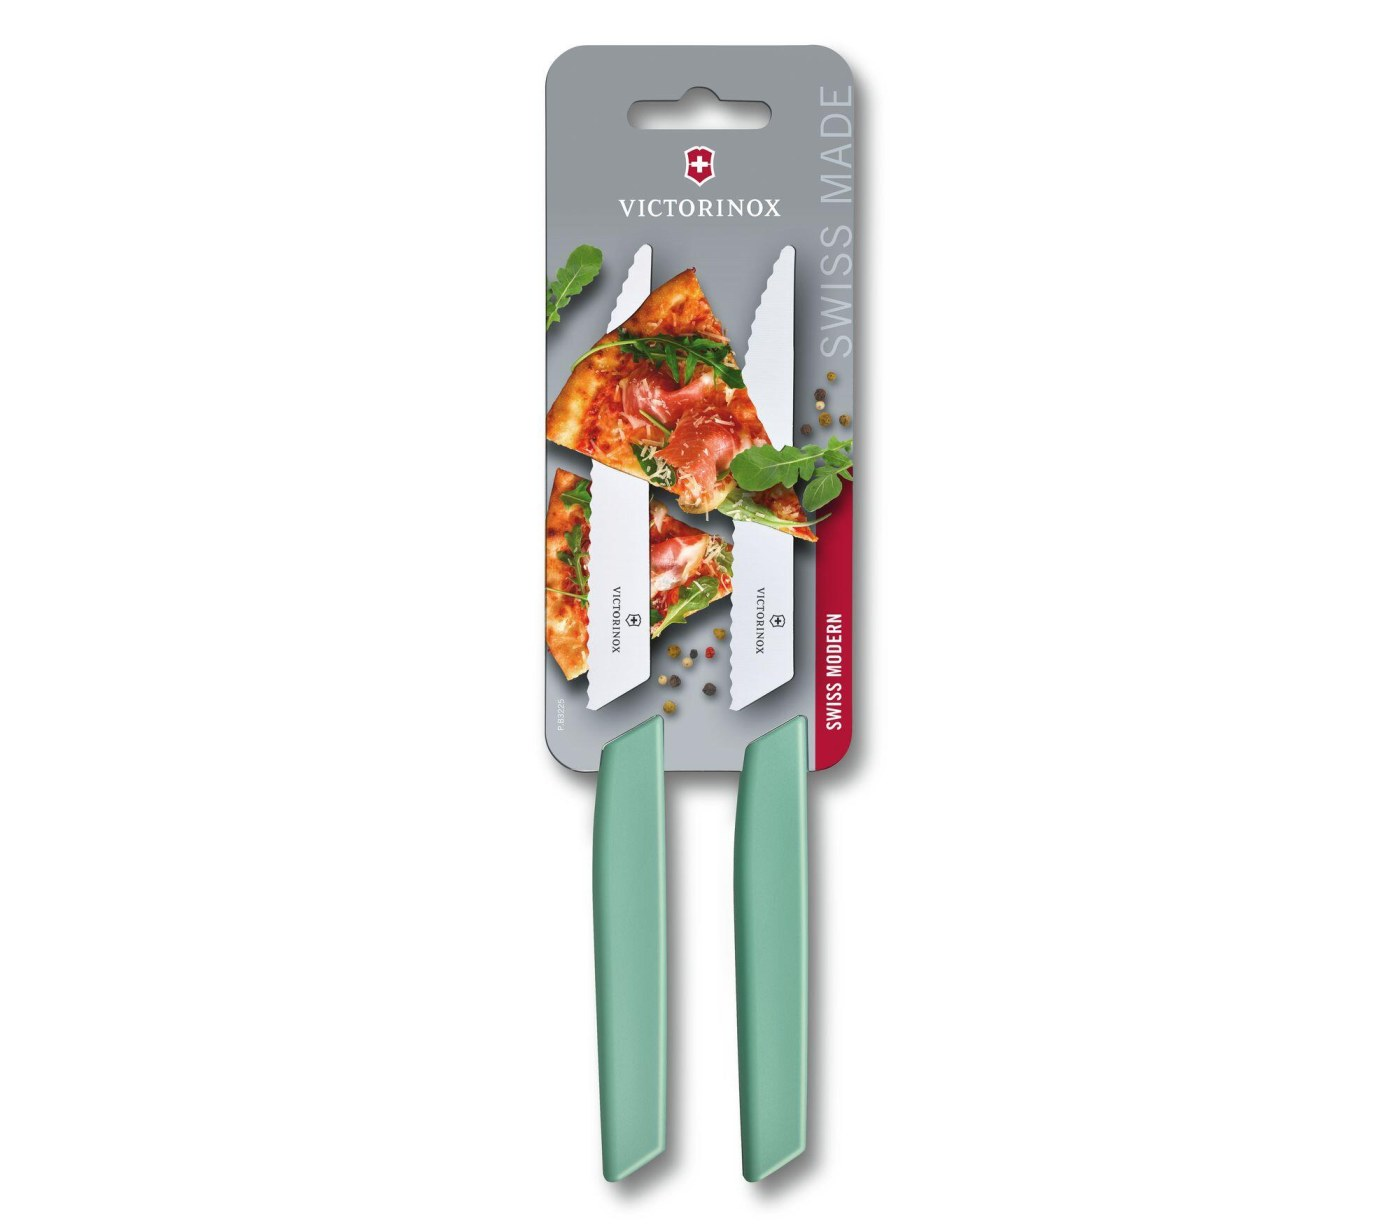 Sada 2 ks steakový nůž 12 cm zelený SWISS MODERN - Victorinox